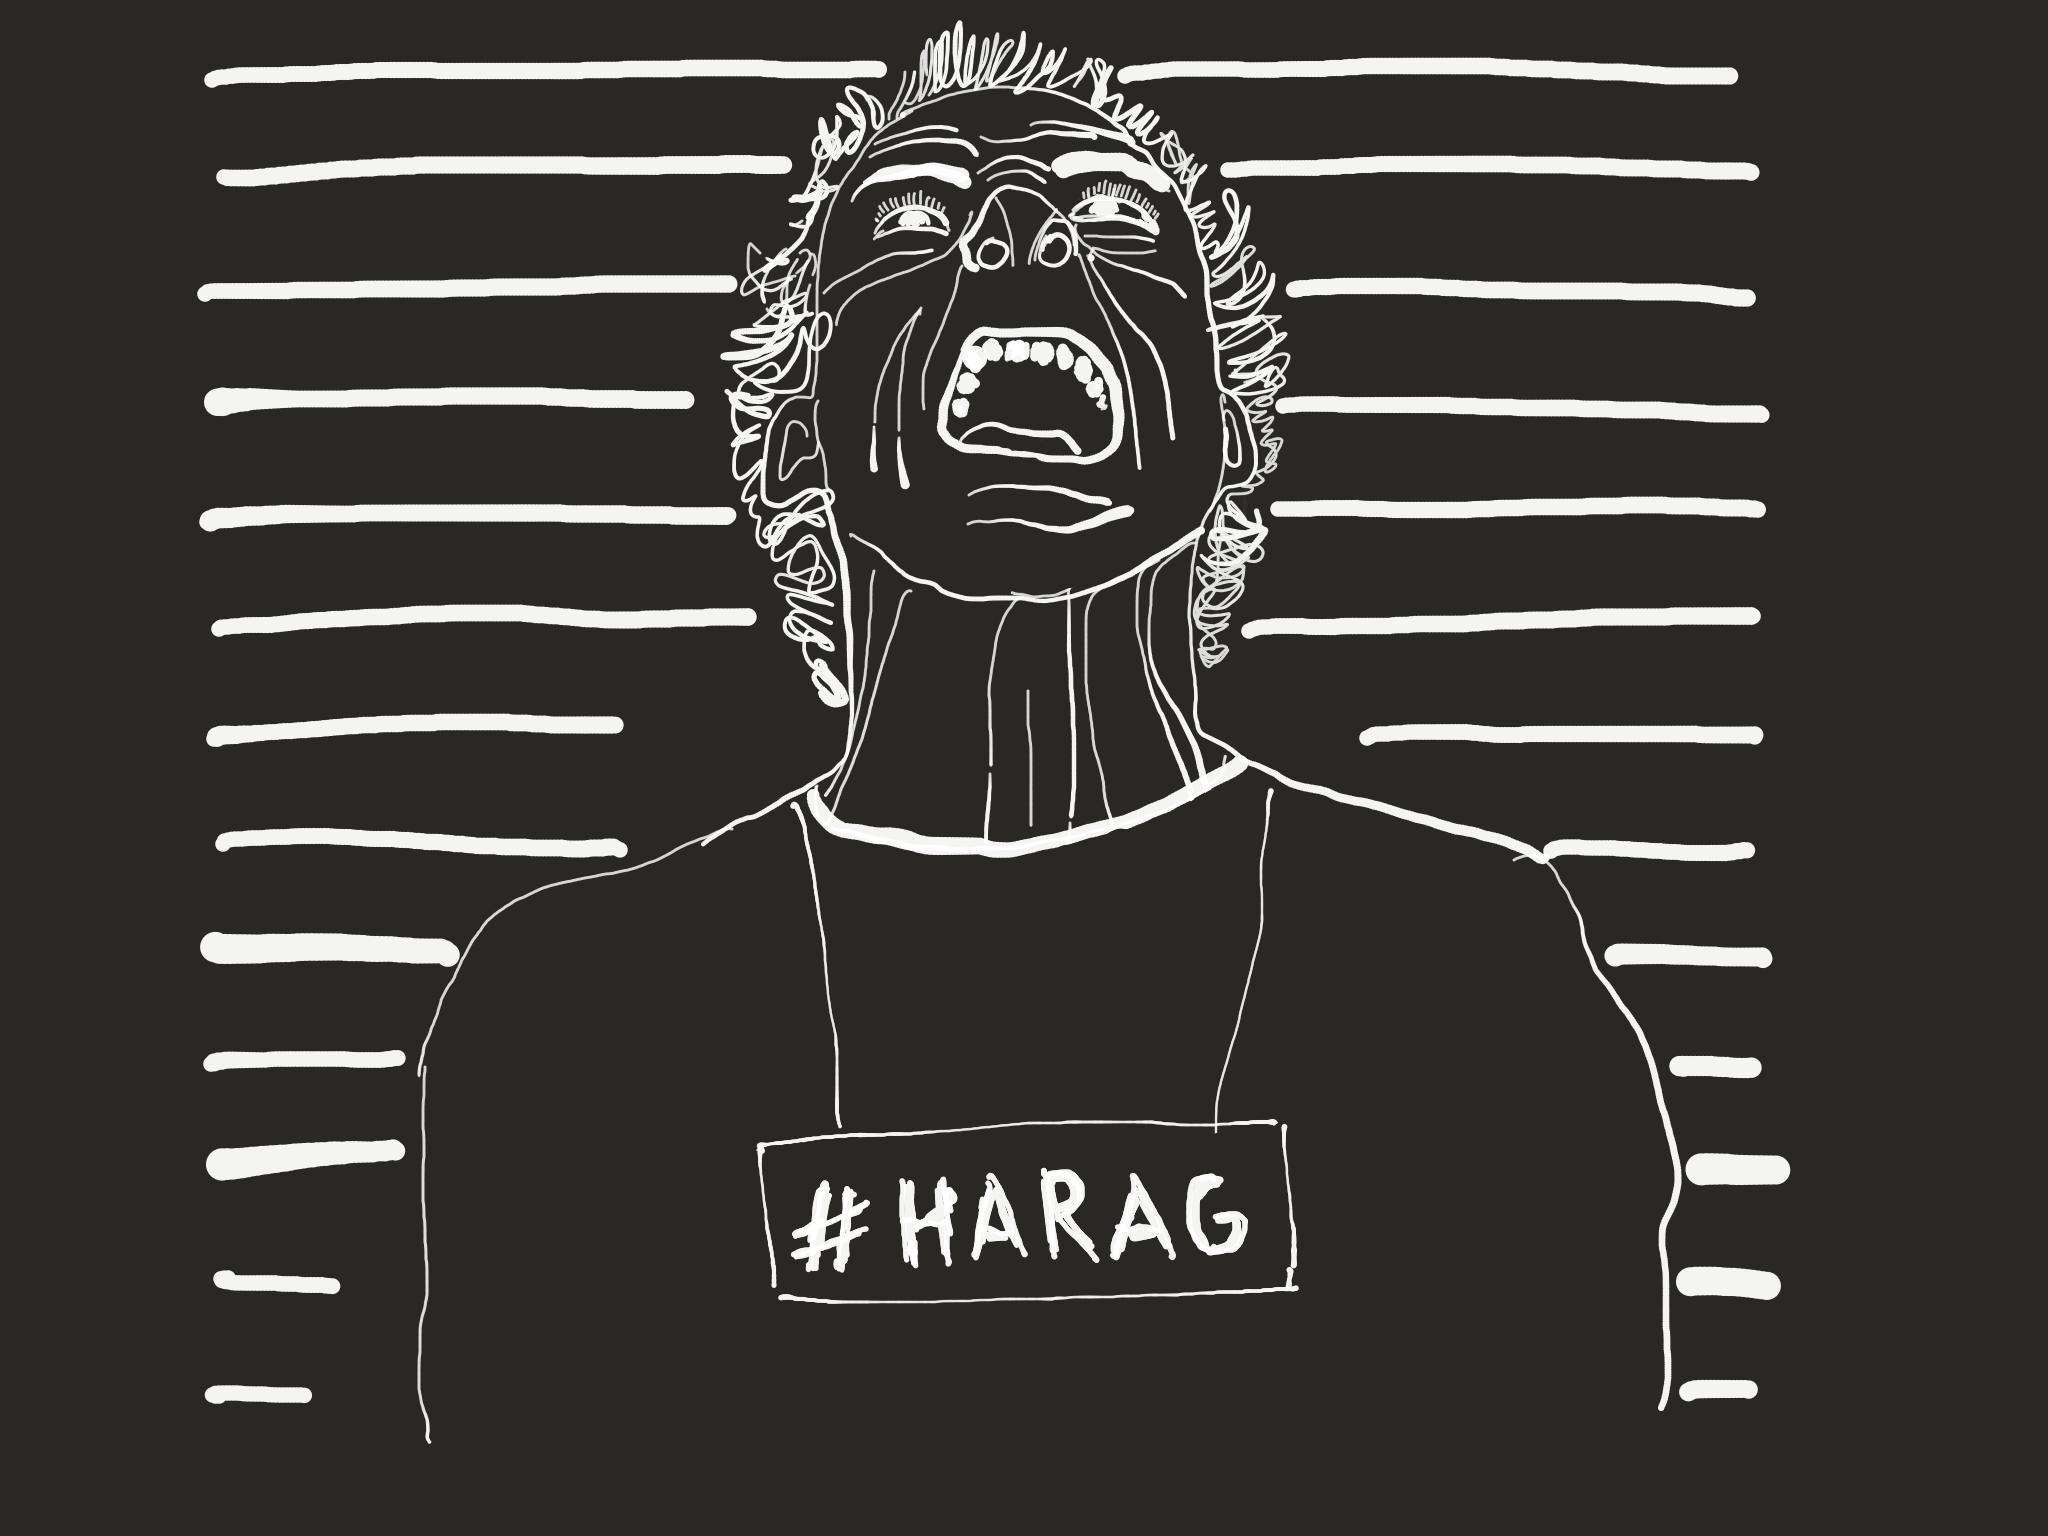 harag_fb.png